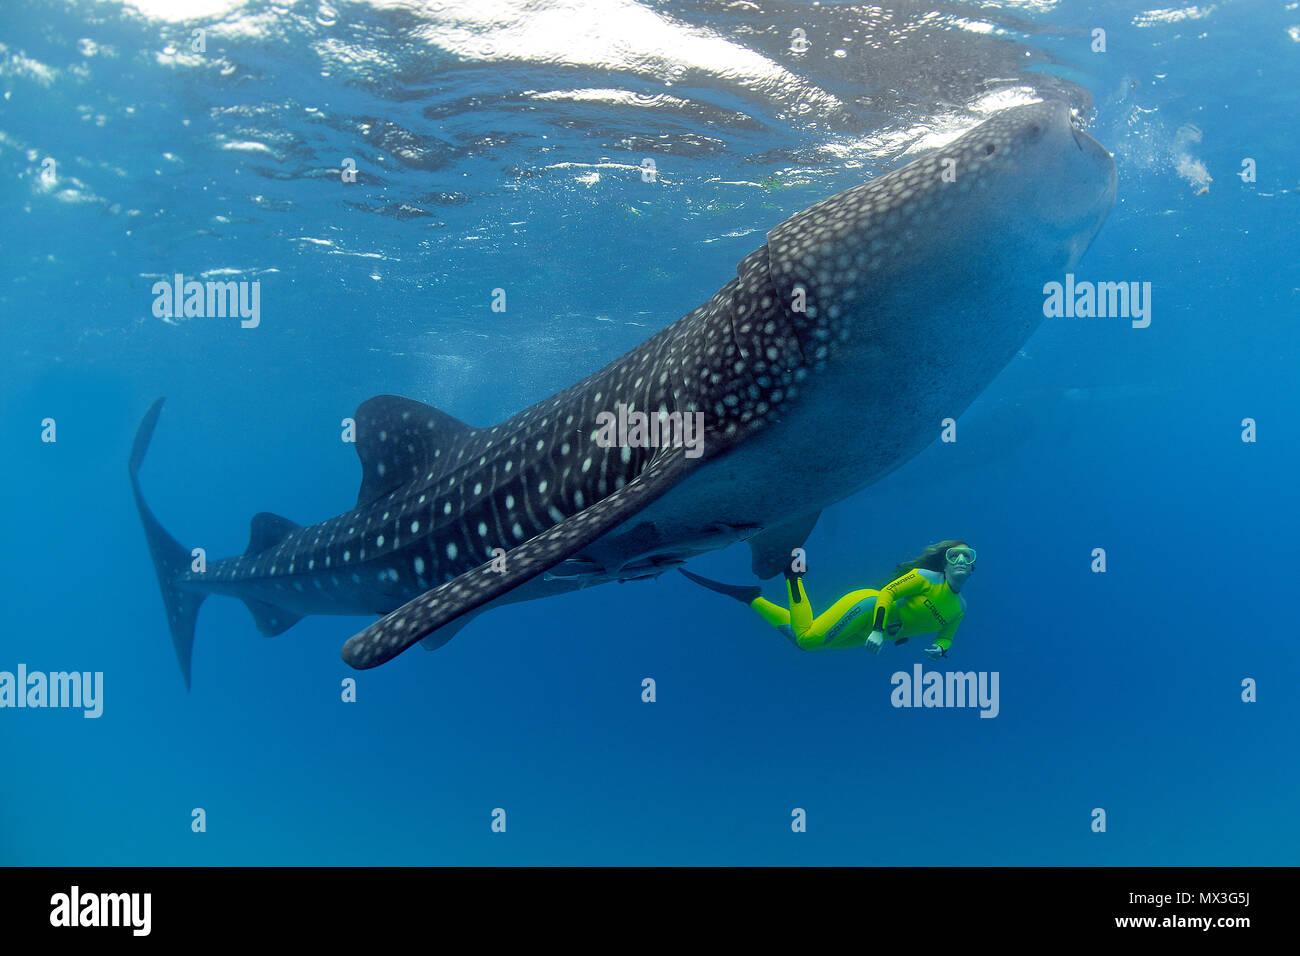 Size comparison, snorkeller and Whale shark (Rhincodon typus), biggest fish of world, Ari Atoll, Maldives islands, Asia - Stock Image